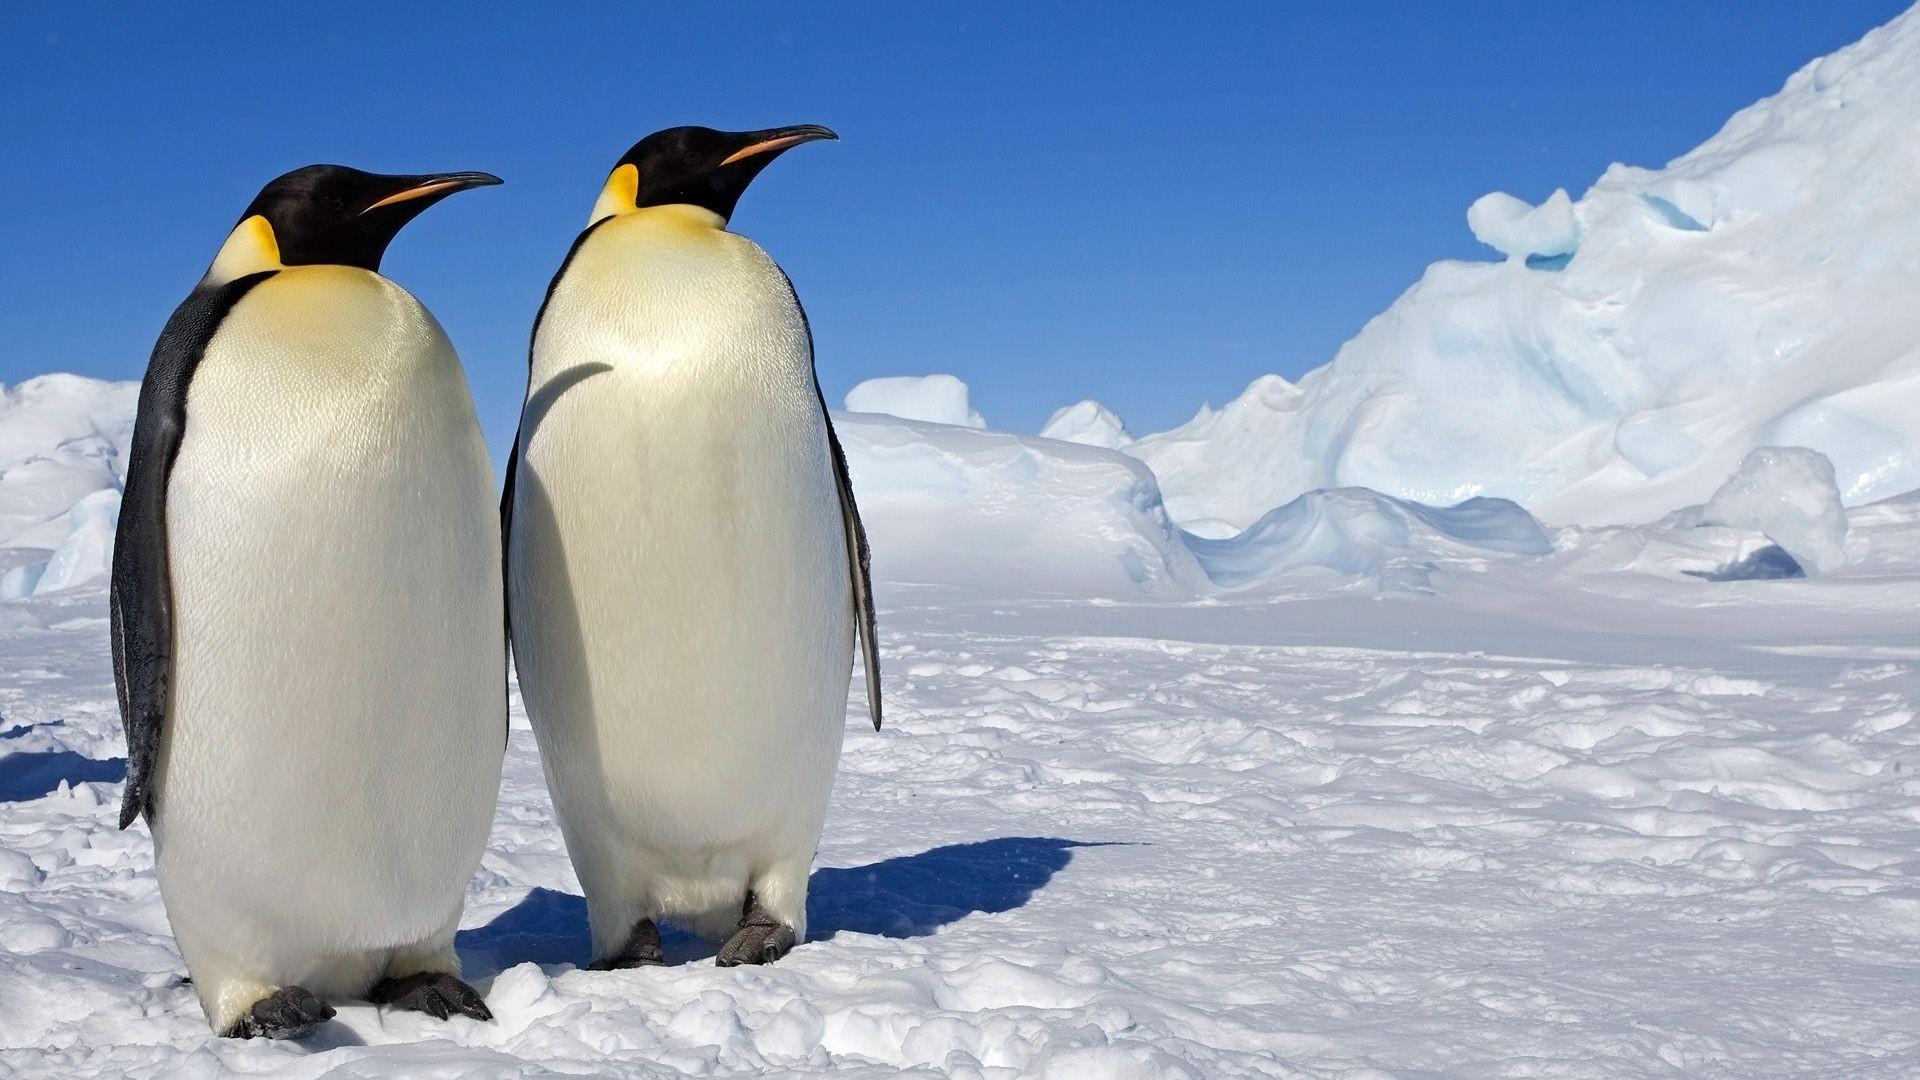 Penguin Wallpaper – https://www.56pic.com/animals-birds/penguin-wallpaper/ |  HD Wallpaper | Pinterest | Penguins, Wallpaper and Animal wallpaper